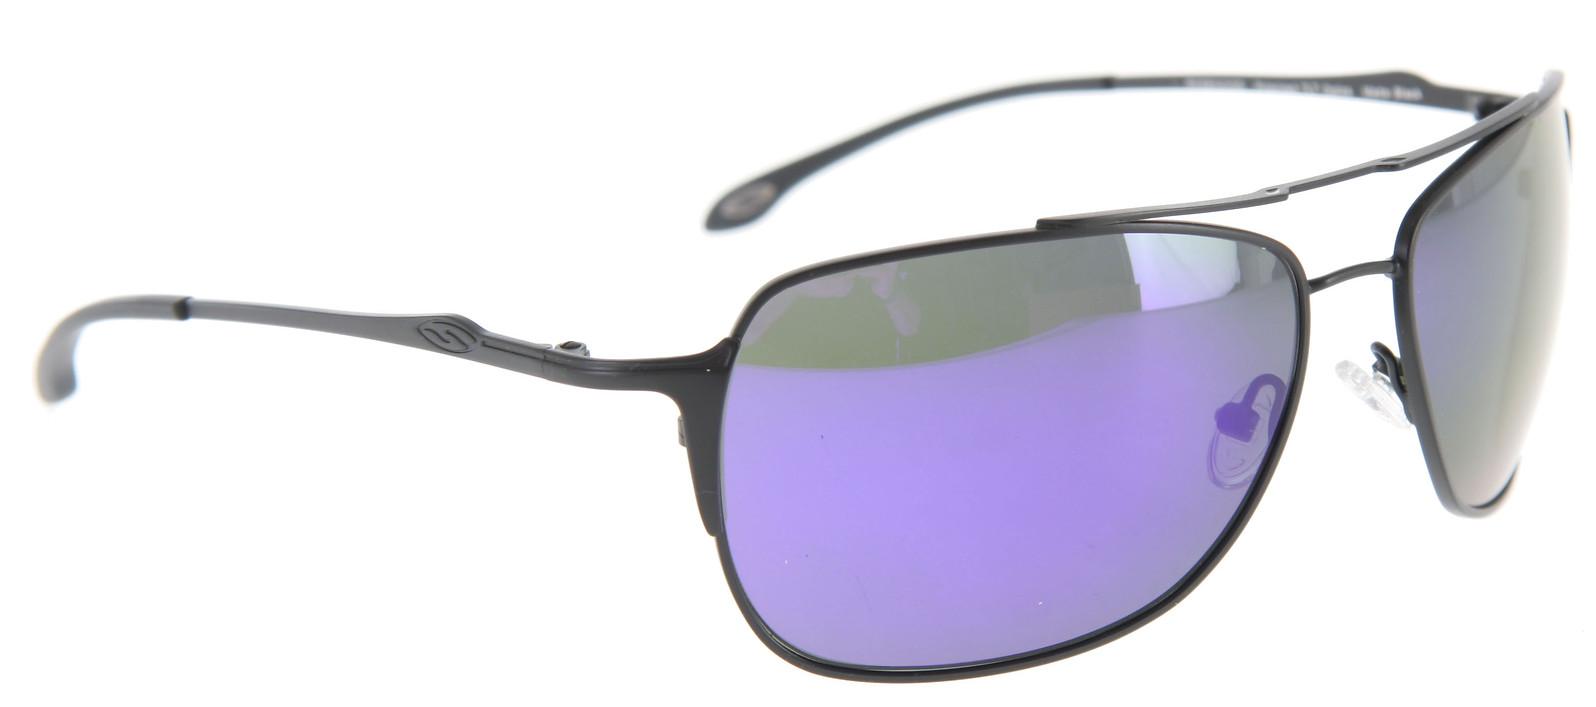 5f4b44aa92 Smith Rosewood Sunglasses Matte Black Polarized Deep Purple Mirror Lens